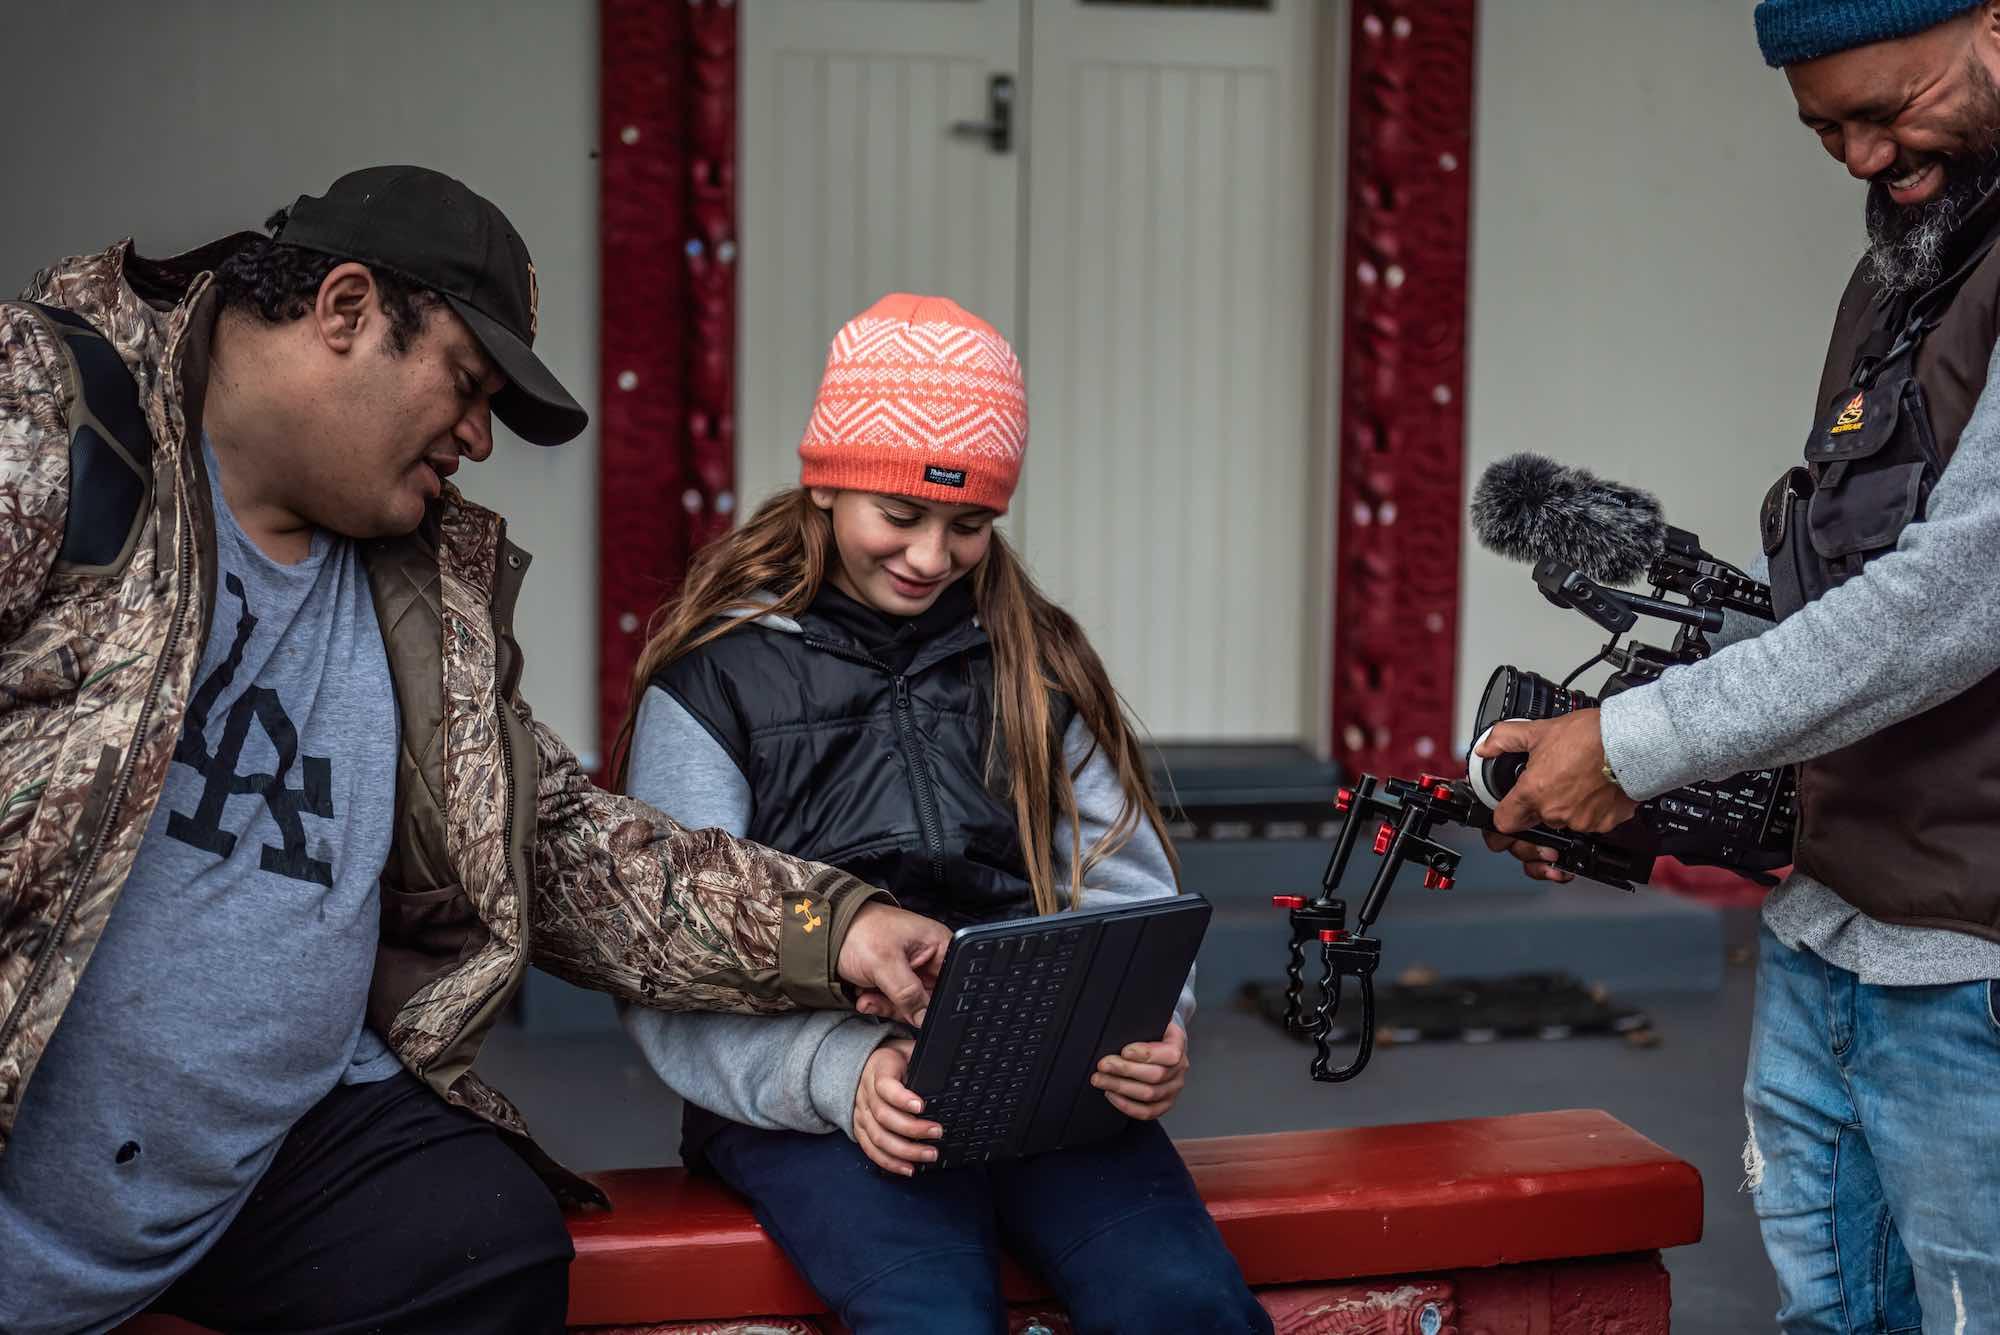 Talent Tihini Grant with Kristin's daughter Hinehui and DOP Rangi Rangitukunoa on the set of Beyond Matariki.